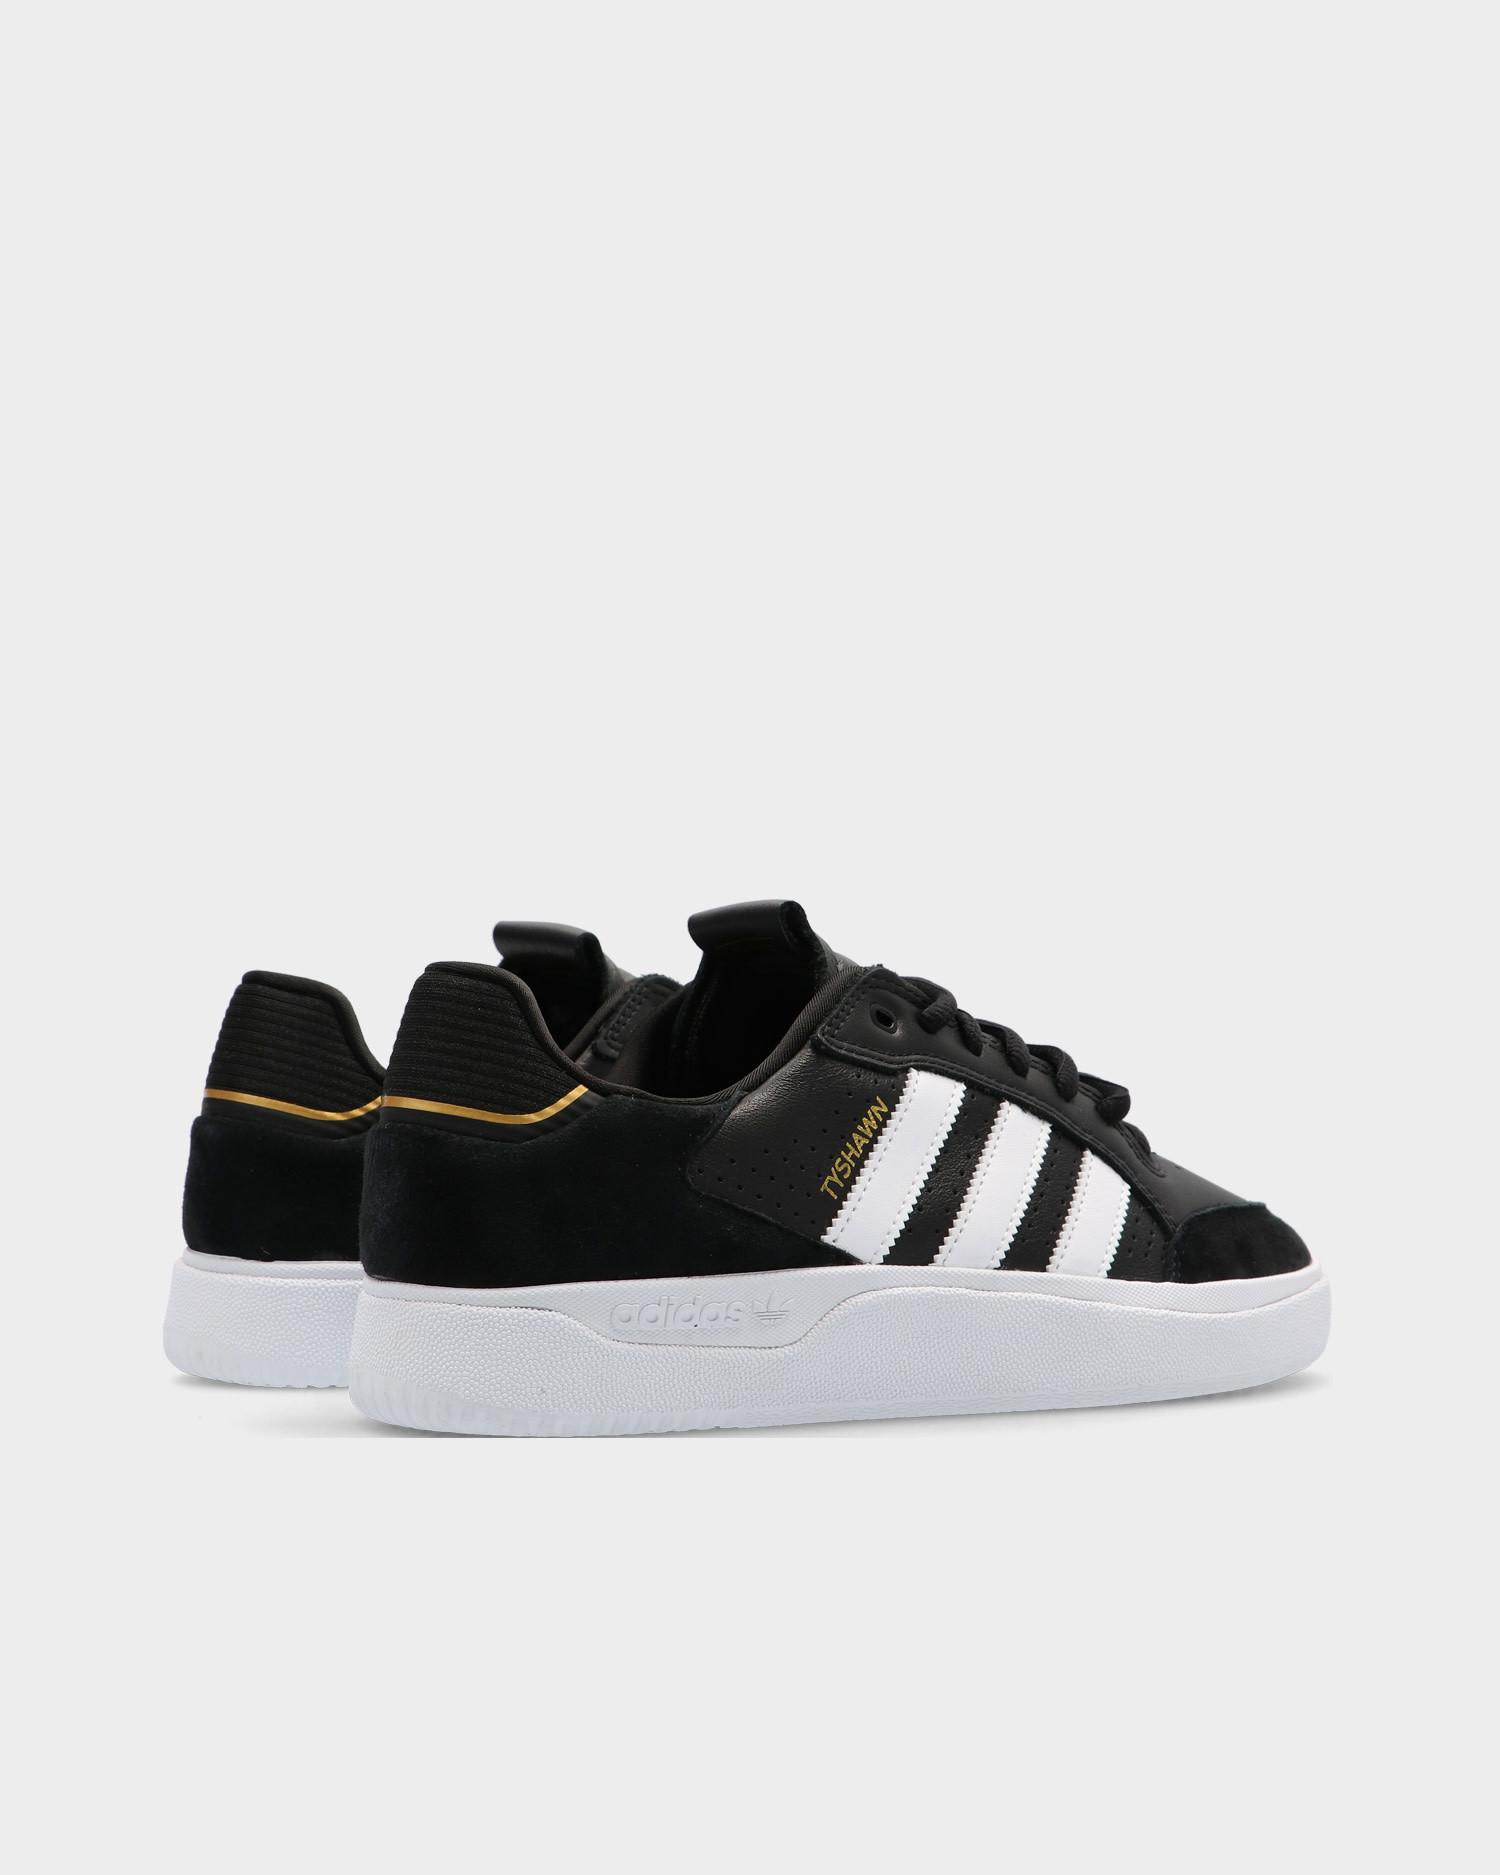 Adidas Skateboarding Tyshawn Low Cblack/ftwwht/Goldmt